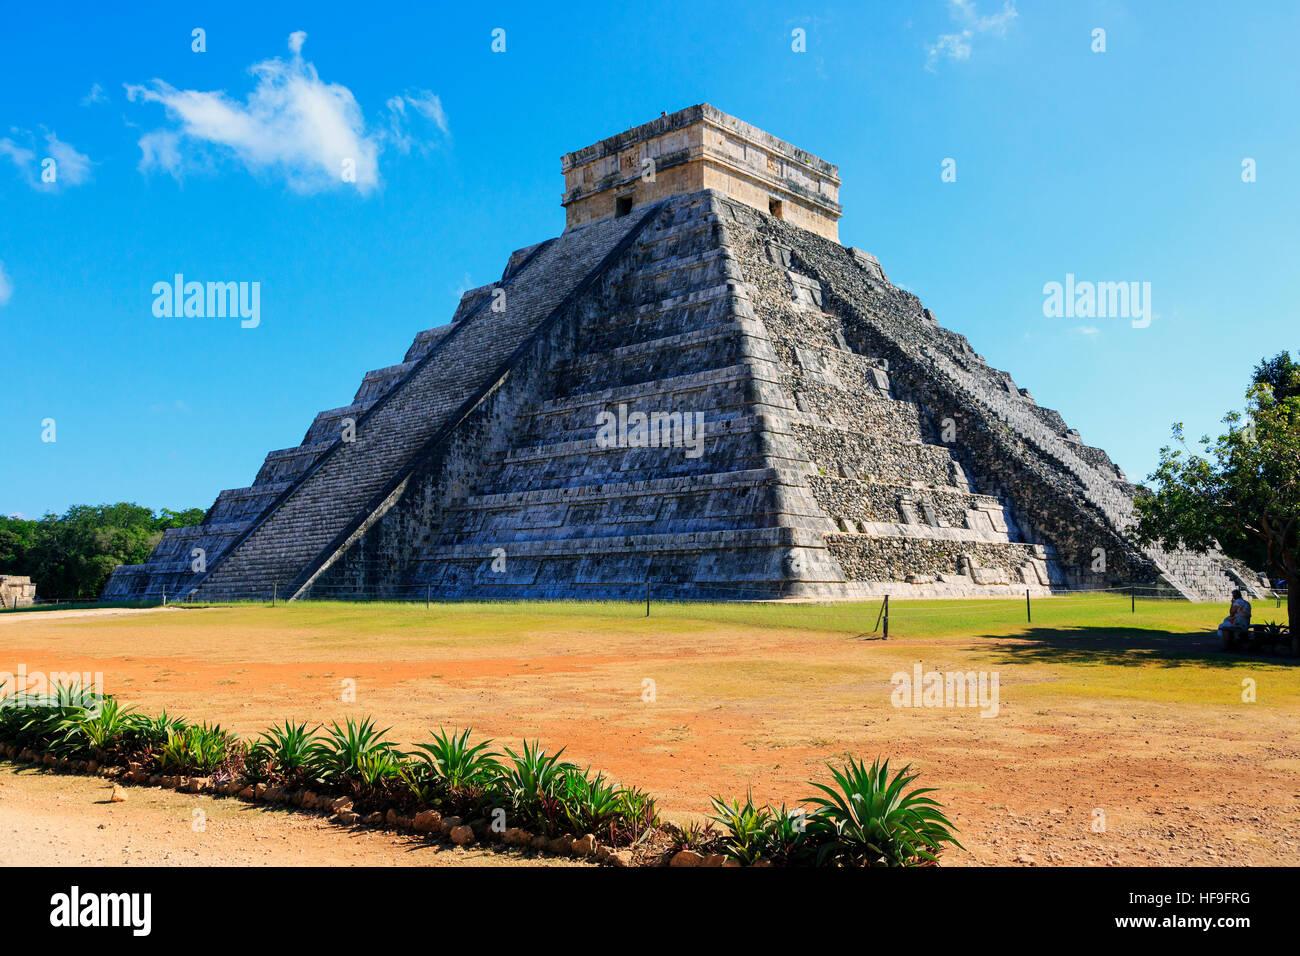 La structure centrale de Castillo, dans l'ancien temple maya de Chichen Itza, Yucatan, Mexique Photo Stock